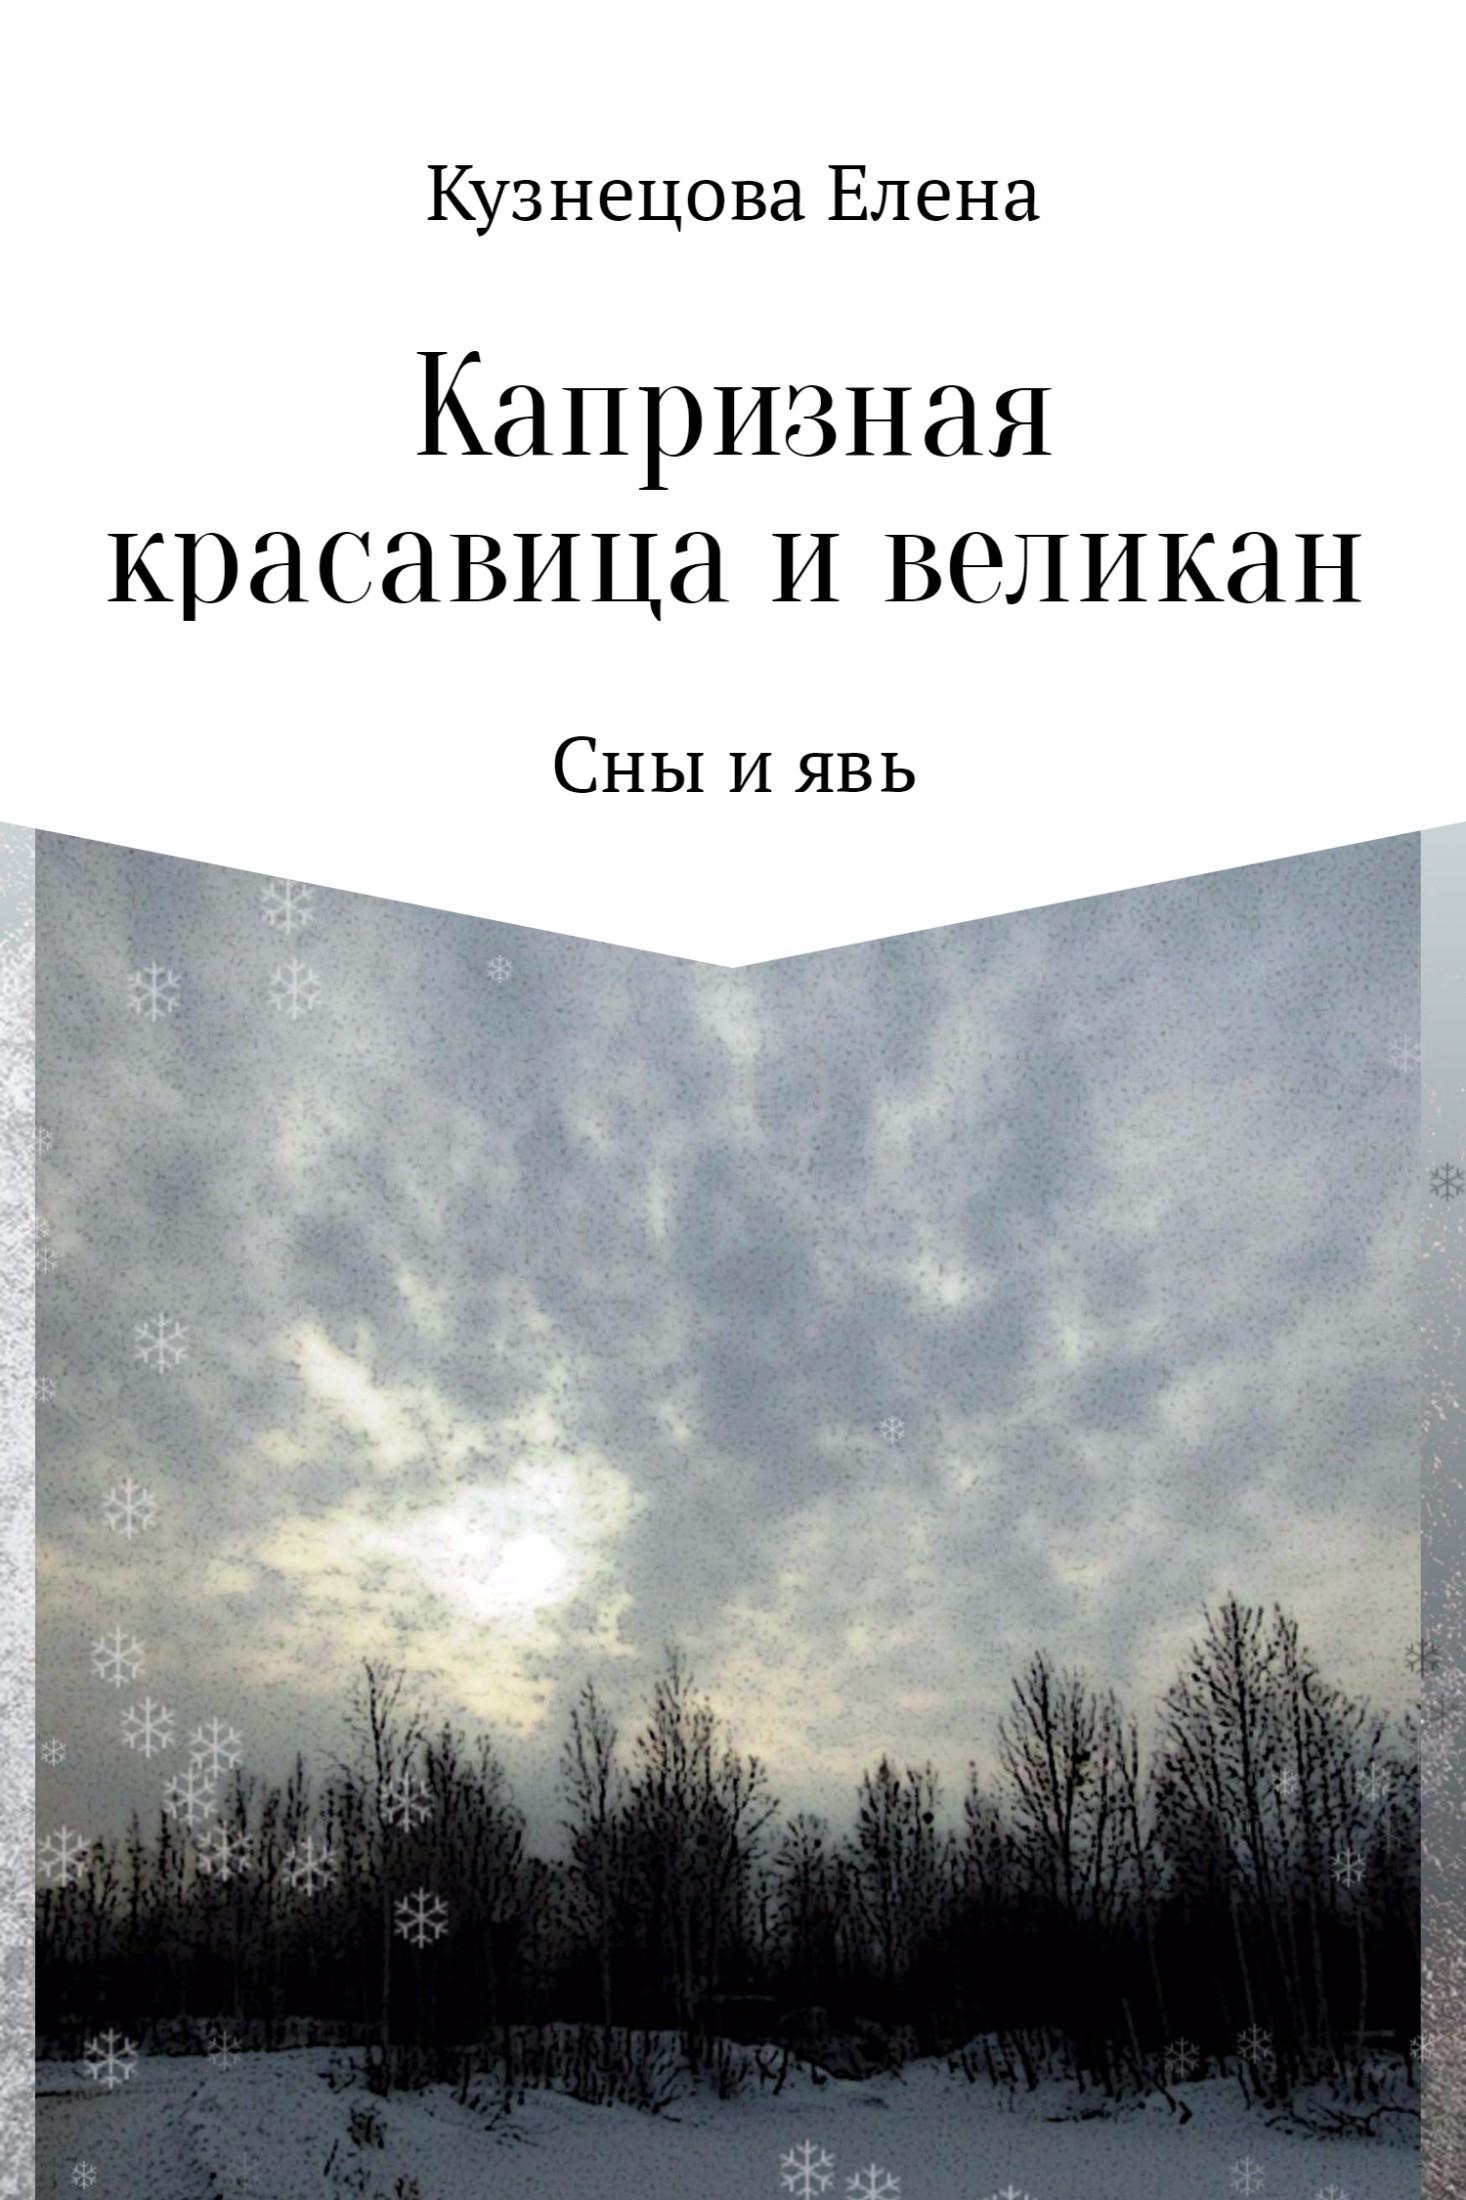 Елена Алексеевна Кузнецова Капризная красавица и великан: Сны и явь четырин а а красавица